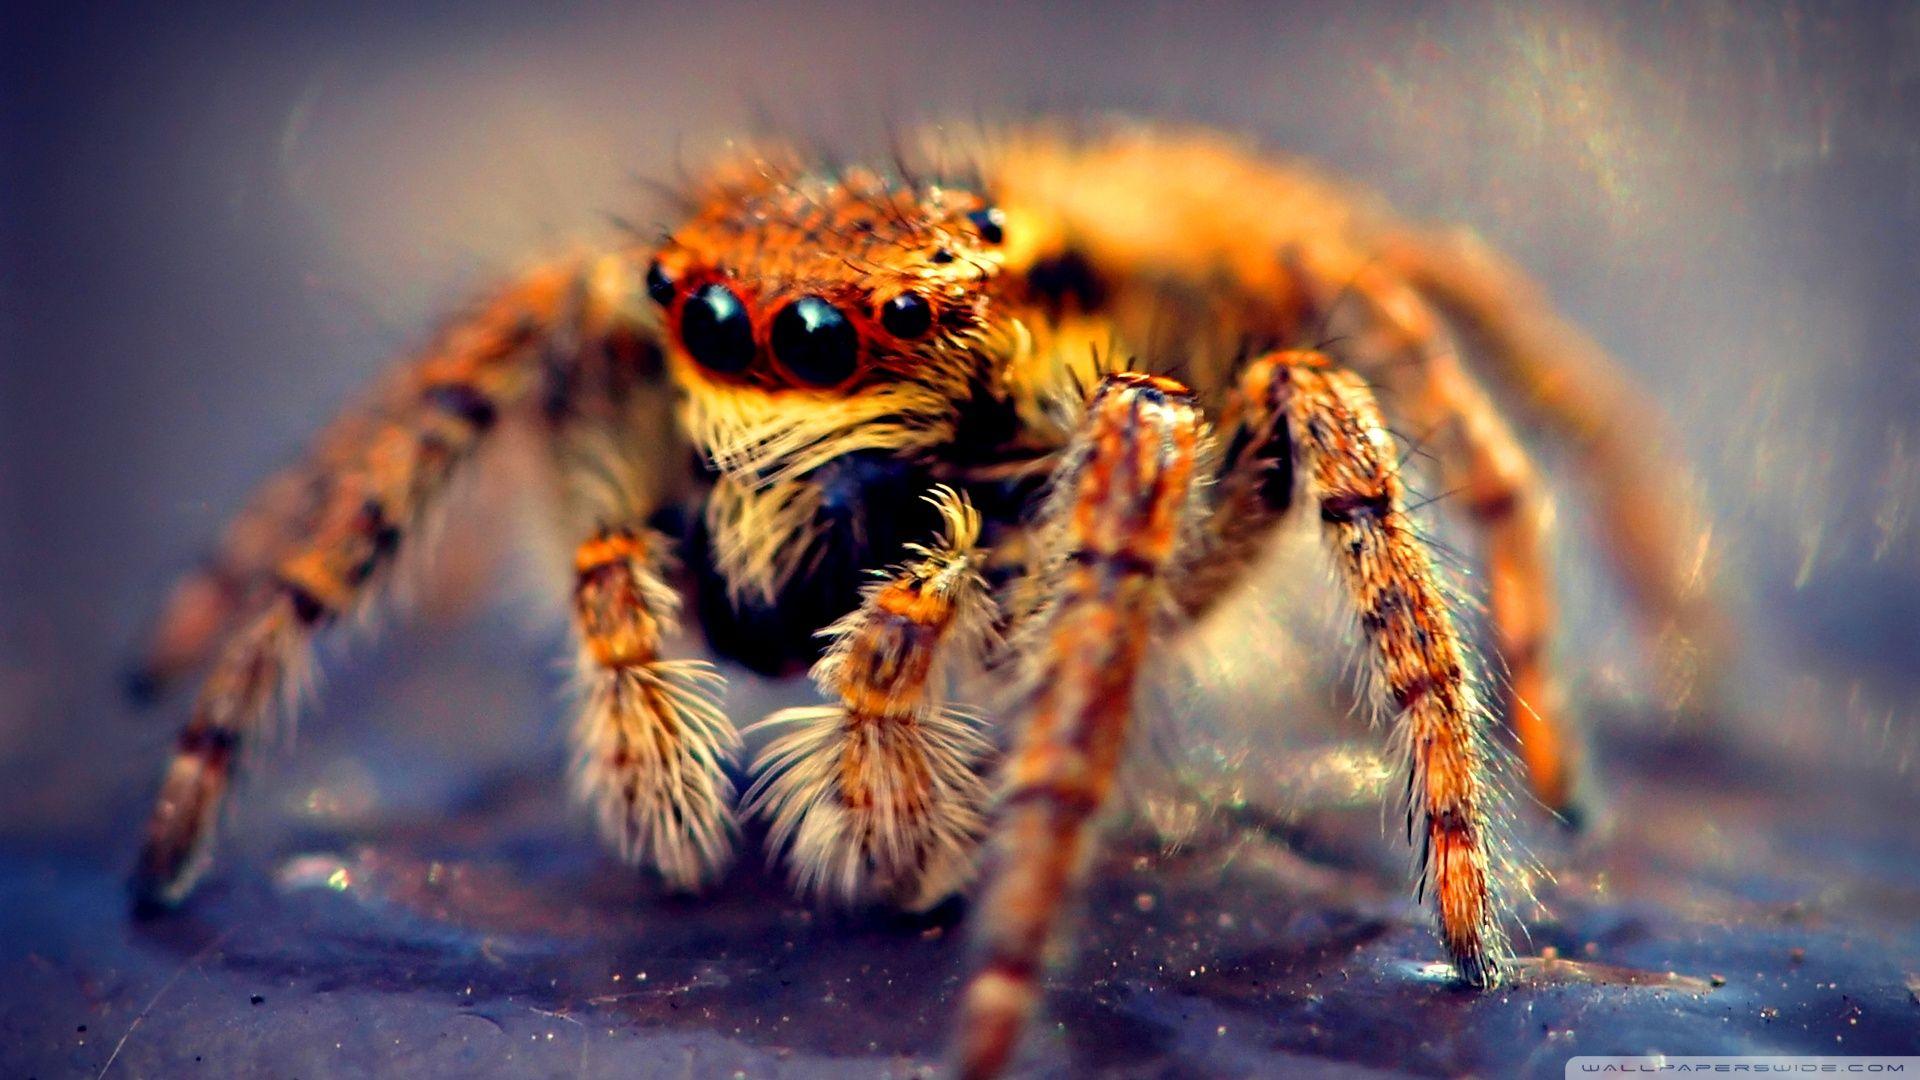 Spider Macro Hd Desktop Wallpaper Widescreen High Definition Spider Animals Animal Wallpaper